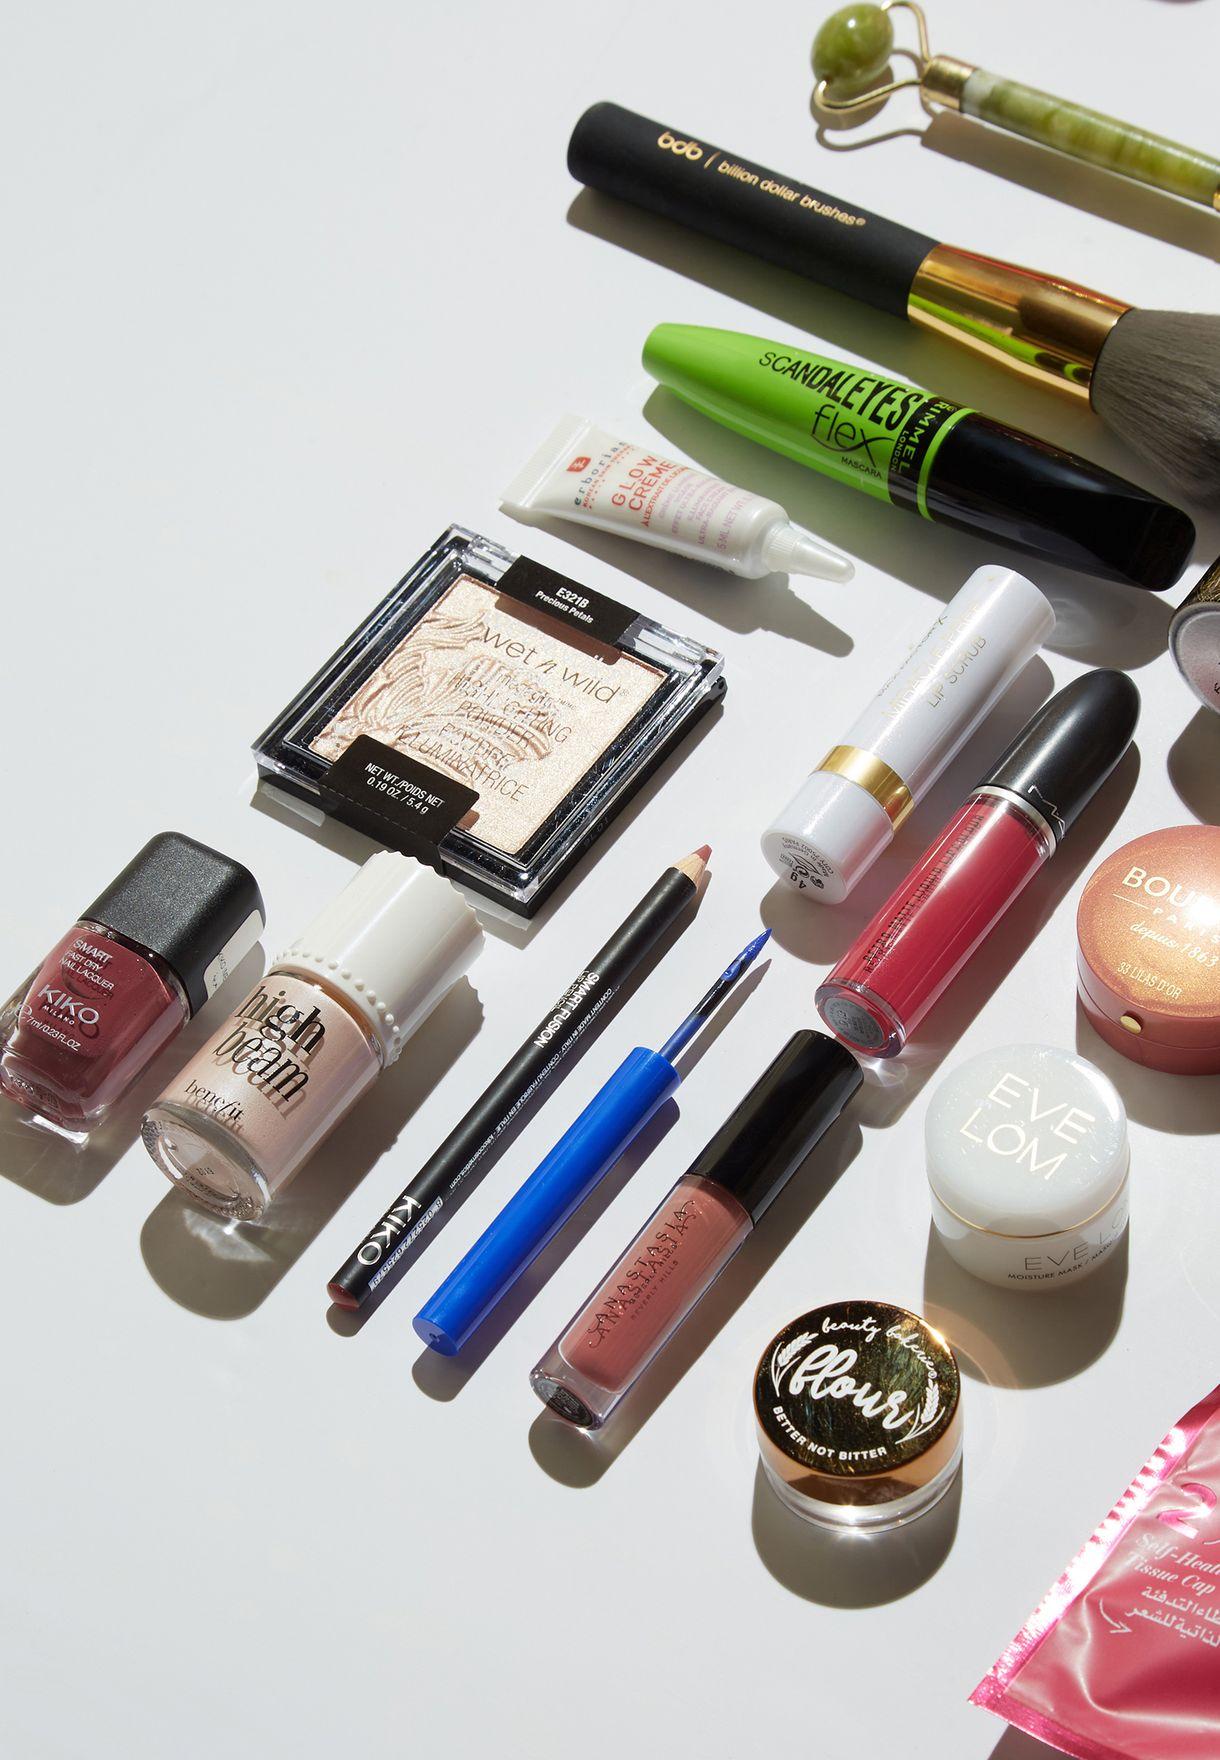 Exclusive Beauty Box, 66% Savings